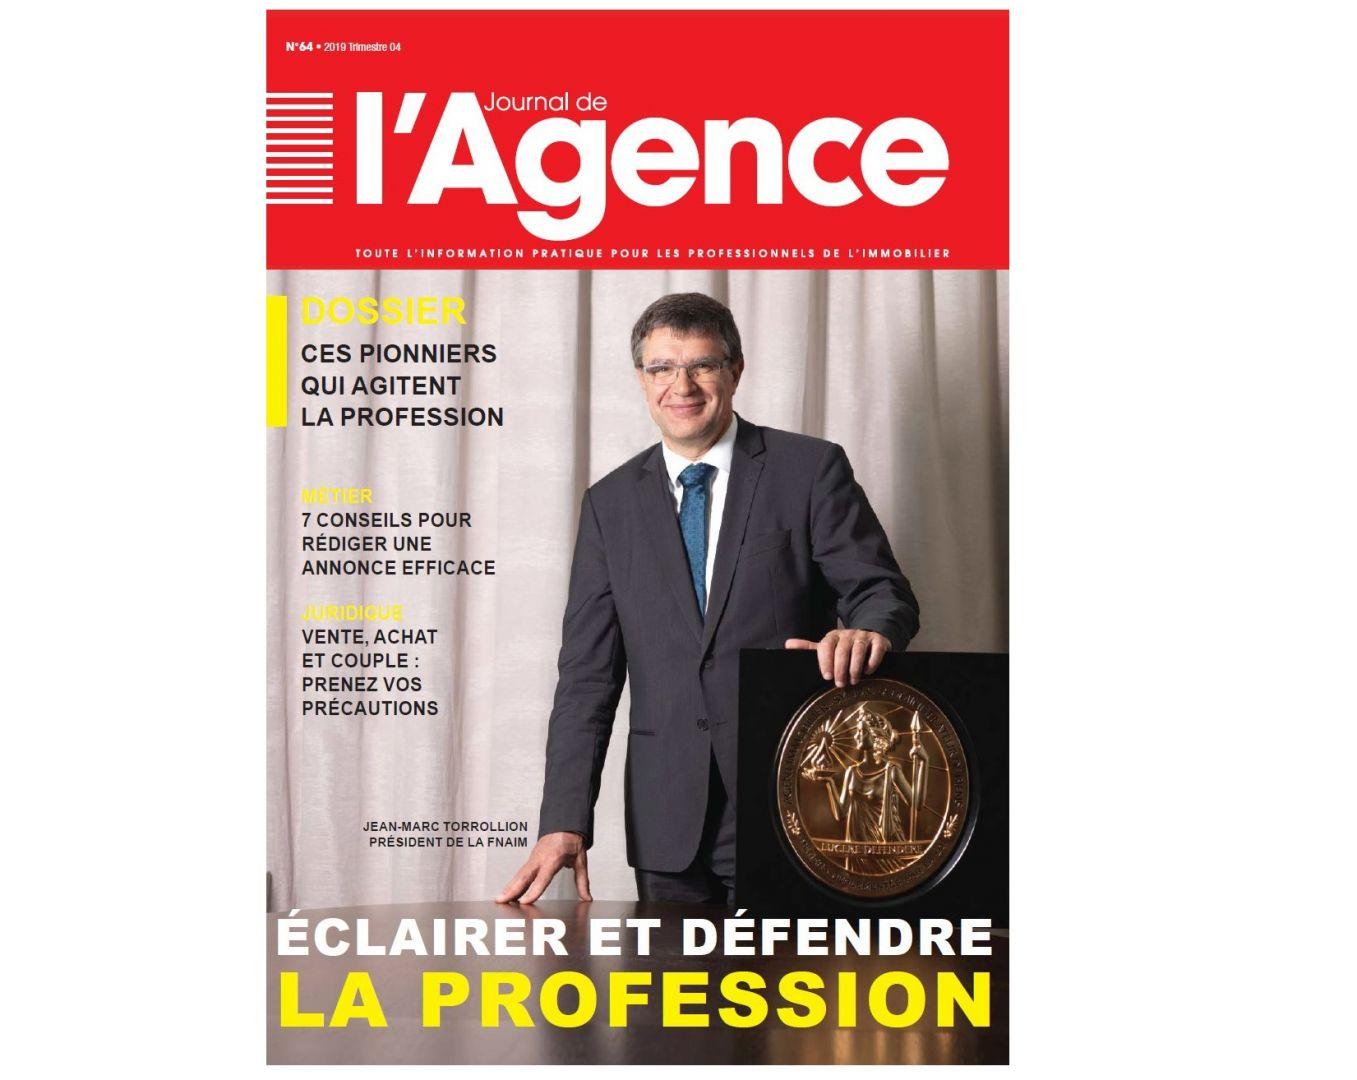 Journal de l'Agence N°64 : « Lucere Defendere »